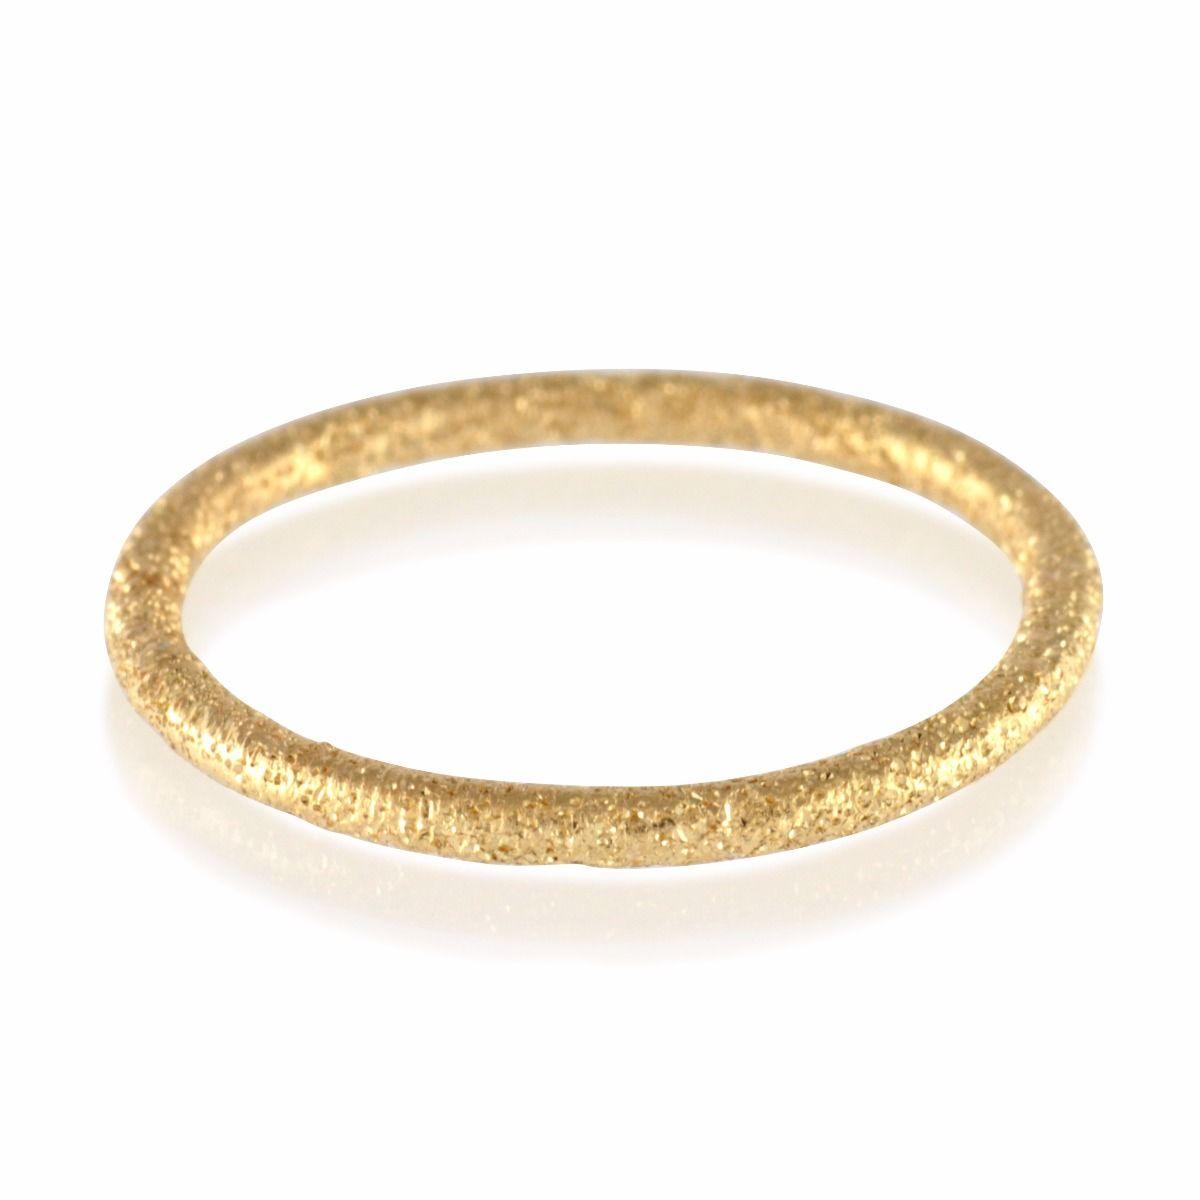 carolina-bucci-yellow-gold-mini-ring-18k-yellow-gold-front.jpg